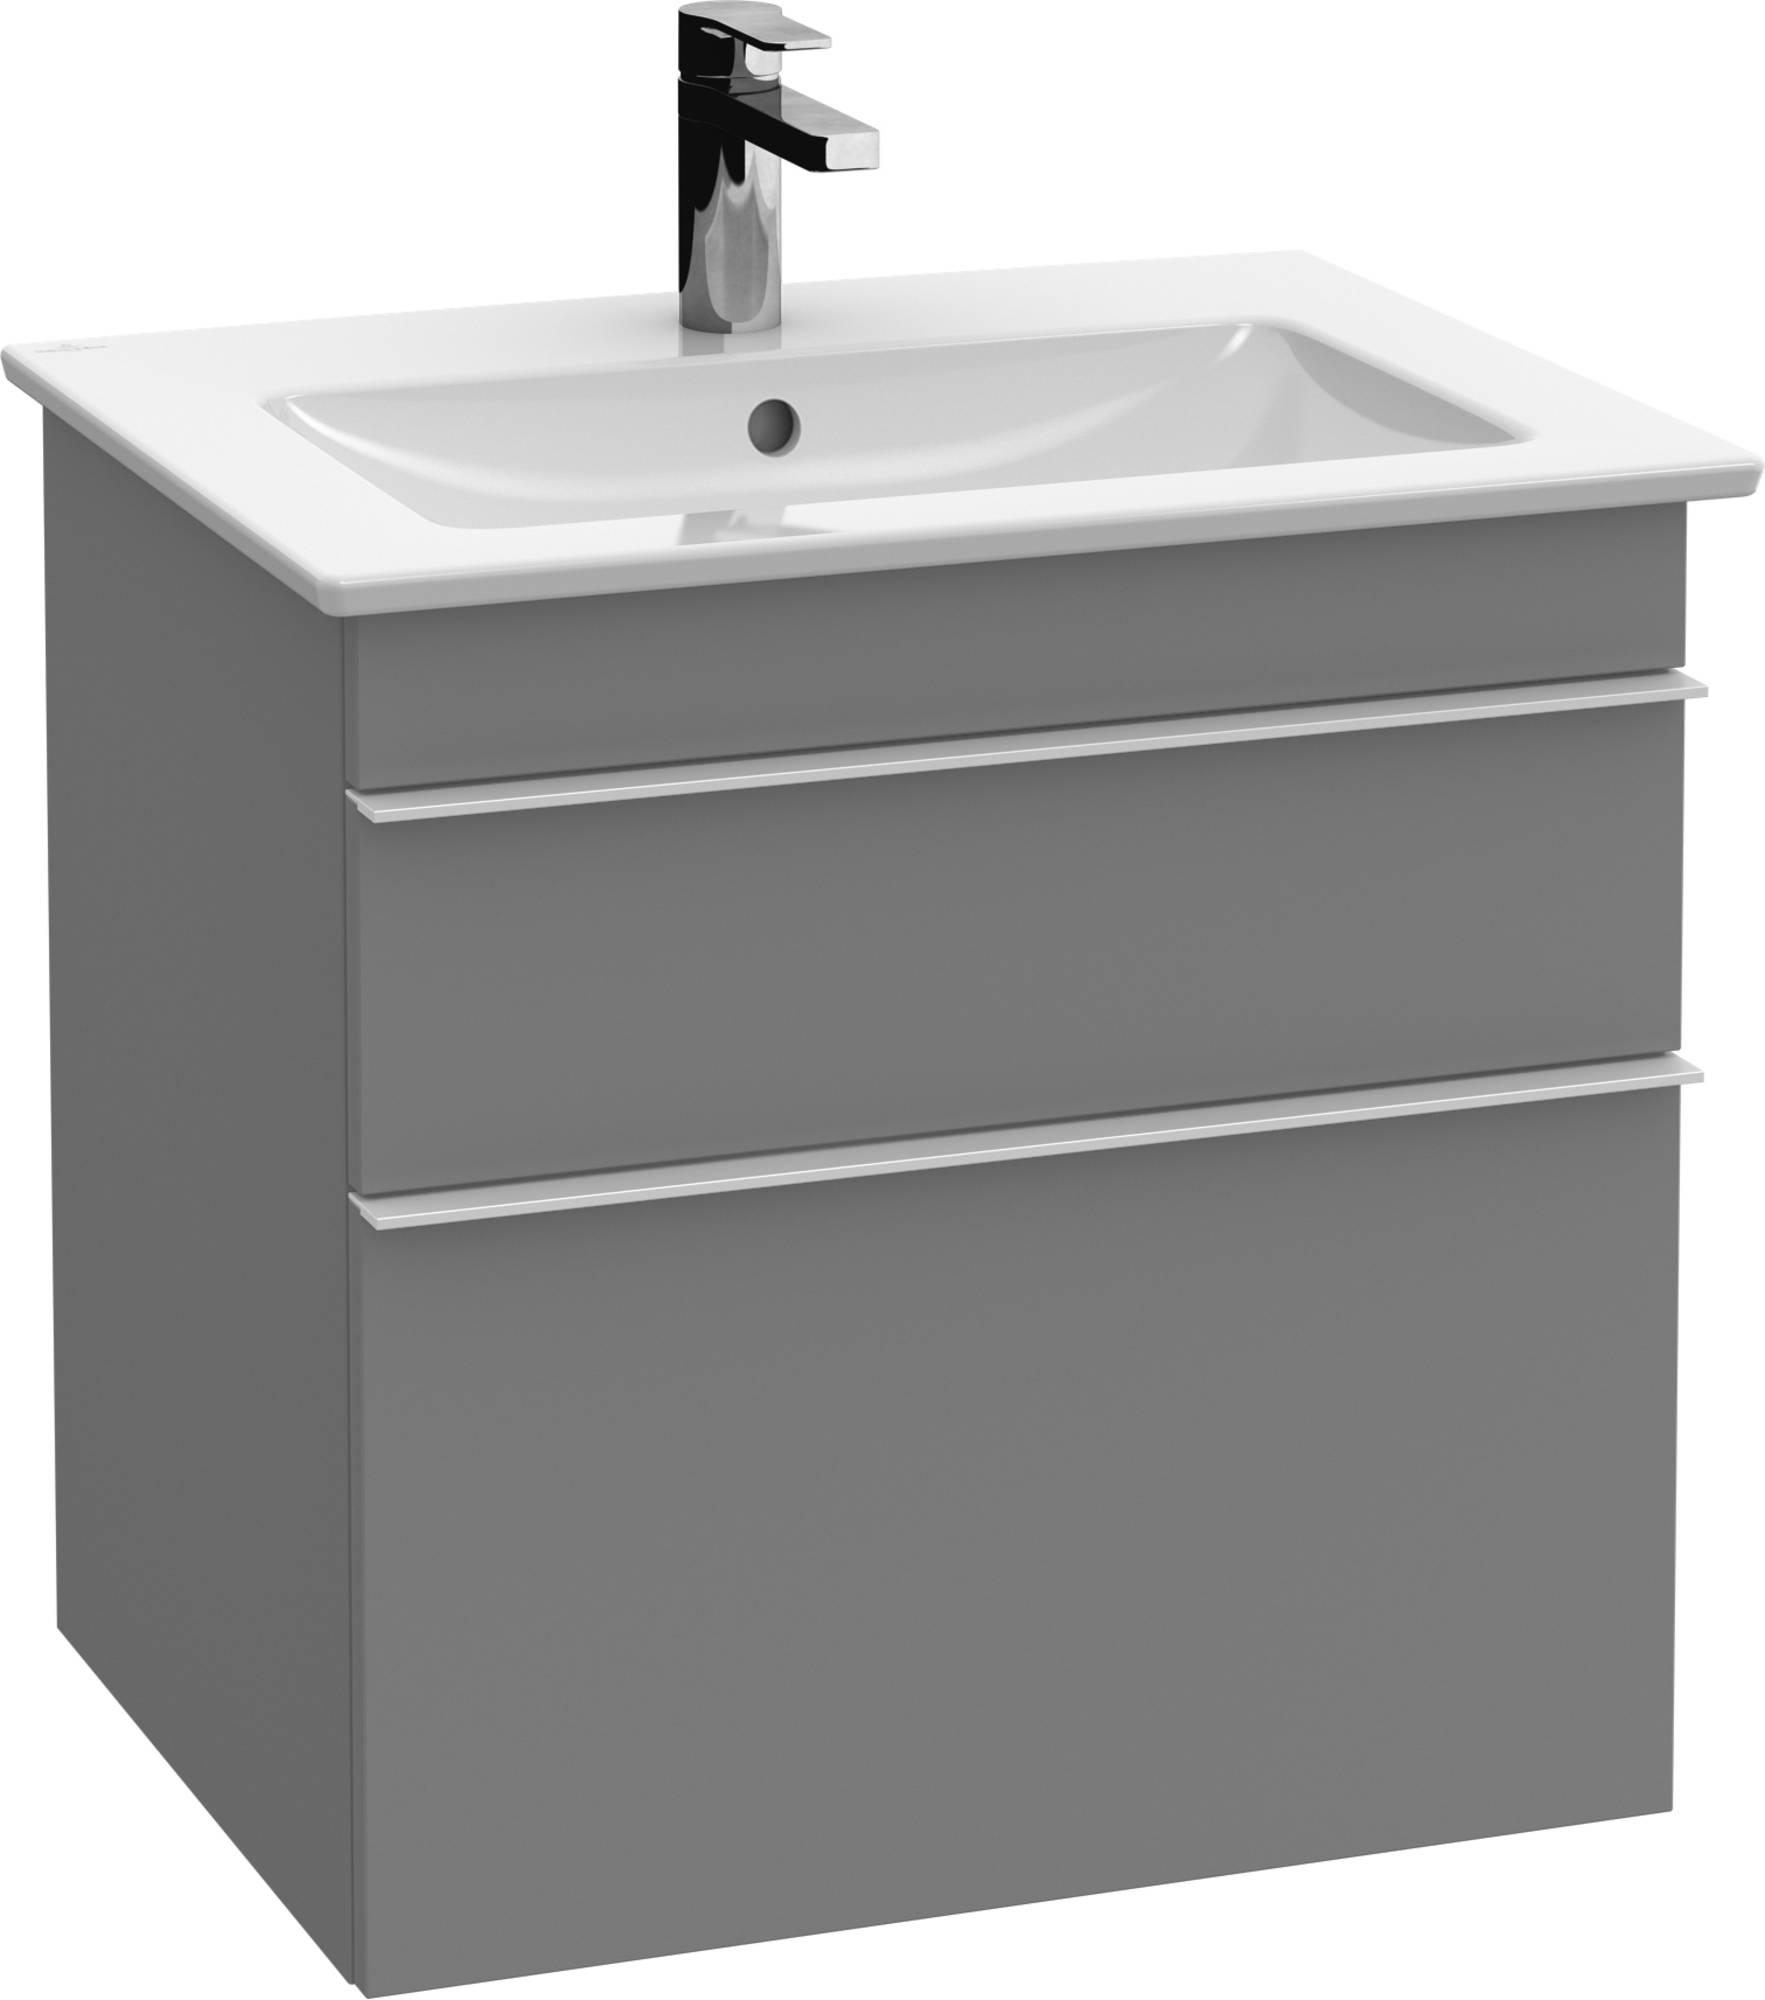 Villeroy&Boch Venticello Wastafelonderkast 55,3x50,2x59  cm  Glossy Grey